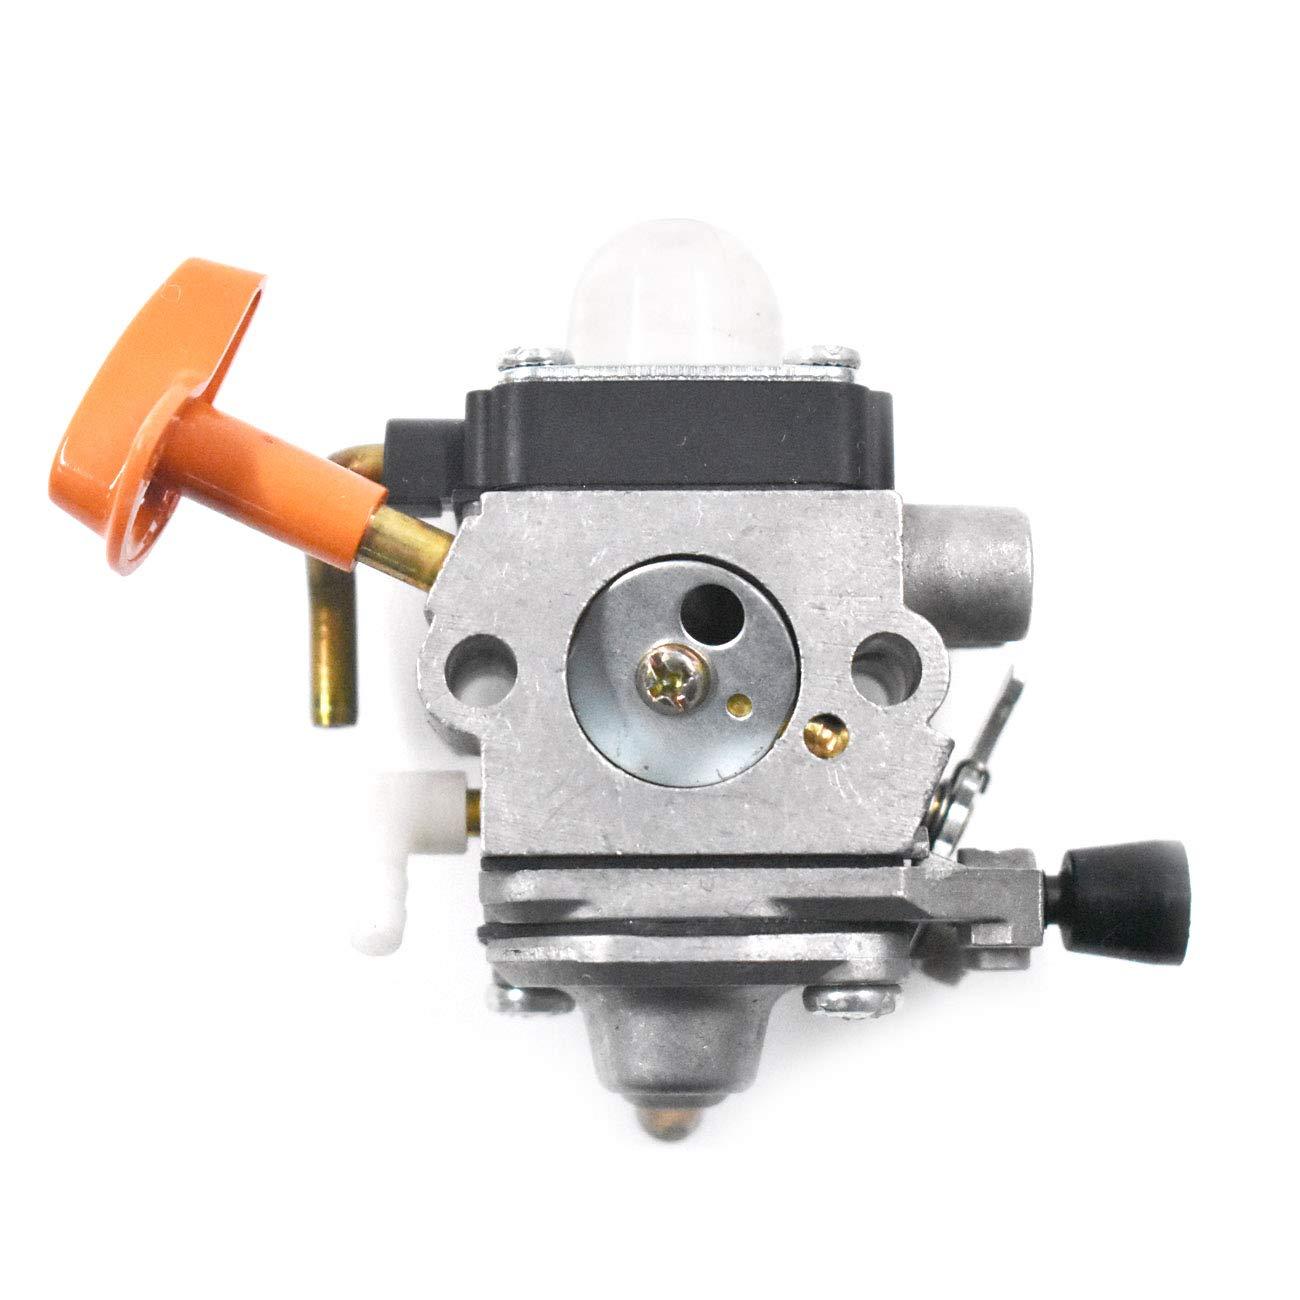 jrl nuevo carburador Carb Para Stihl FC100 FC110 FC90 FC95 FS87 ...